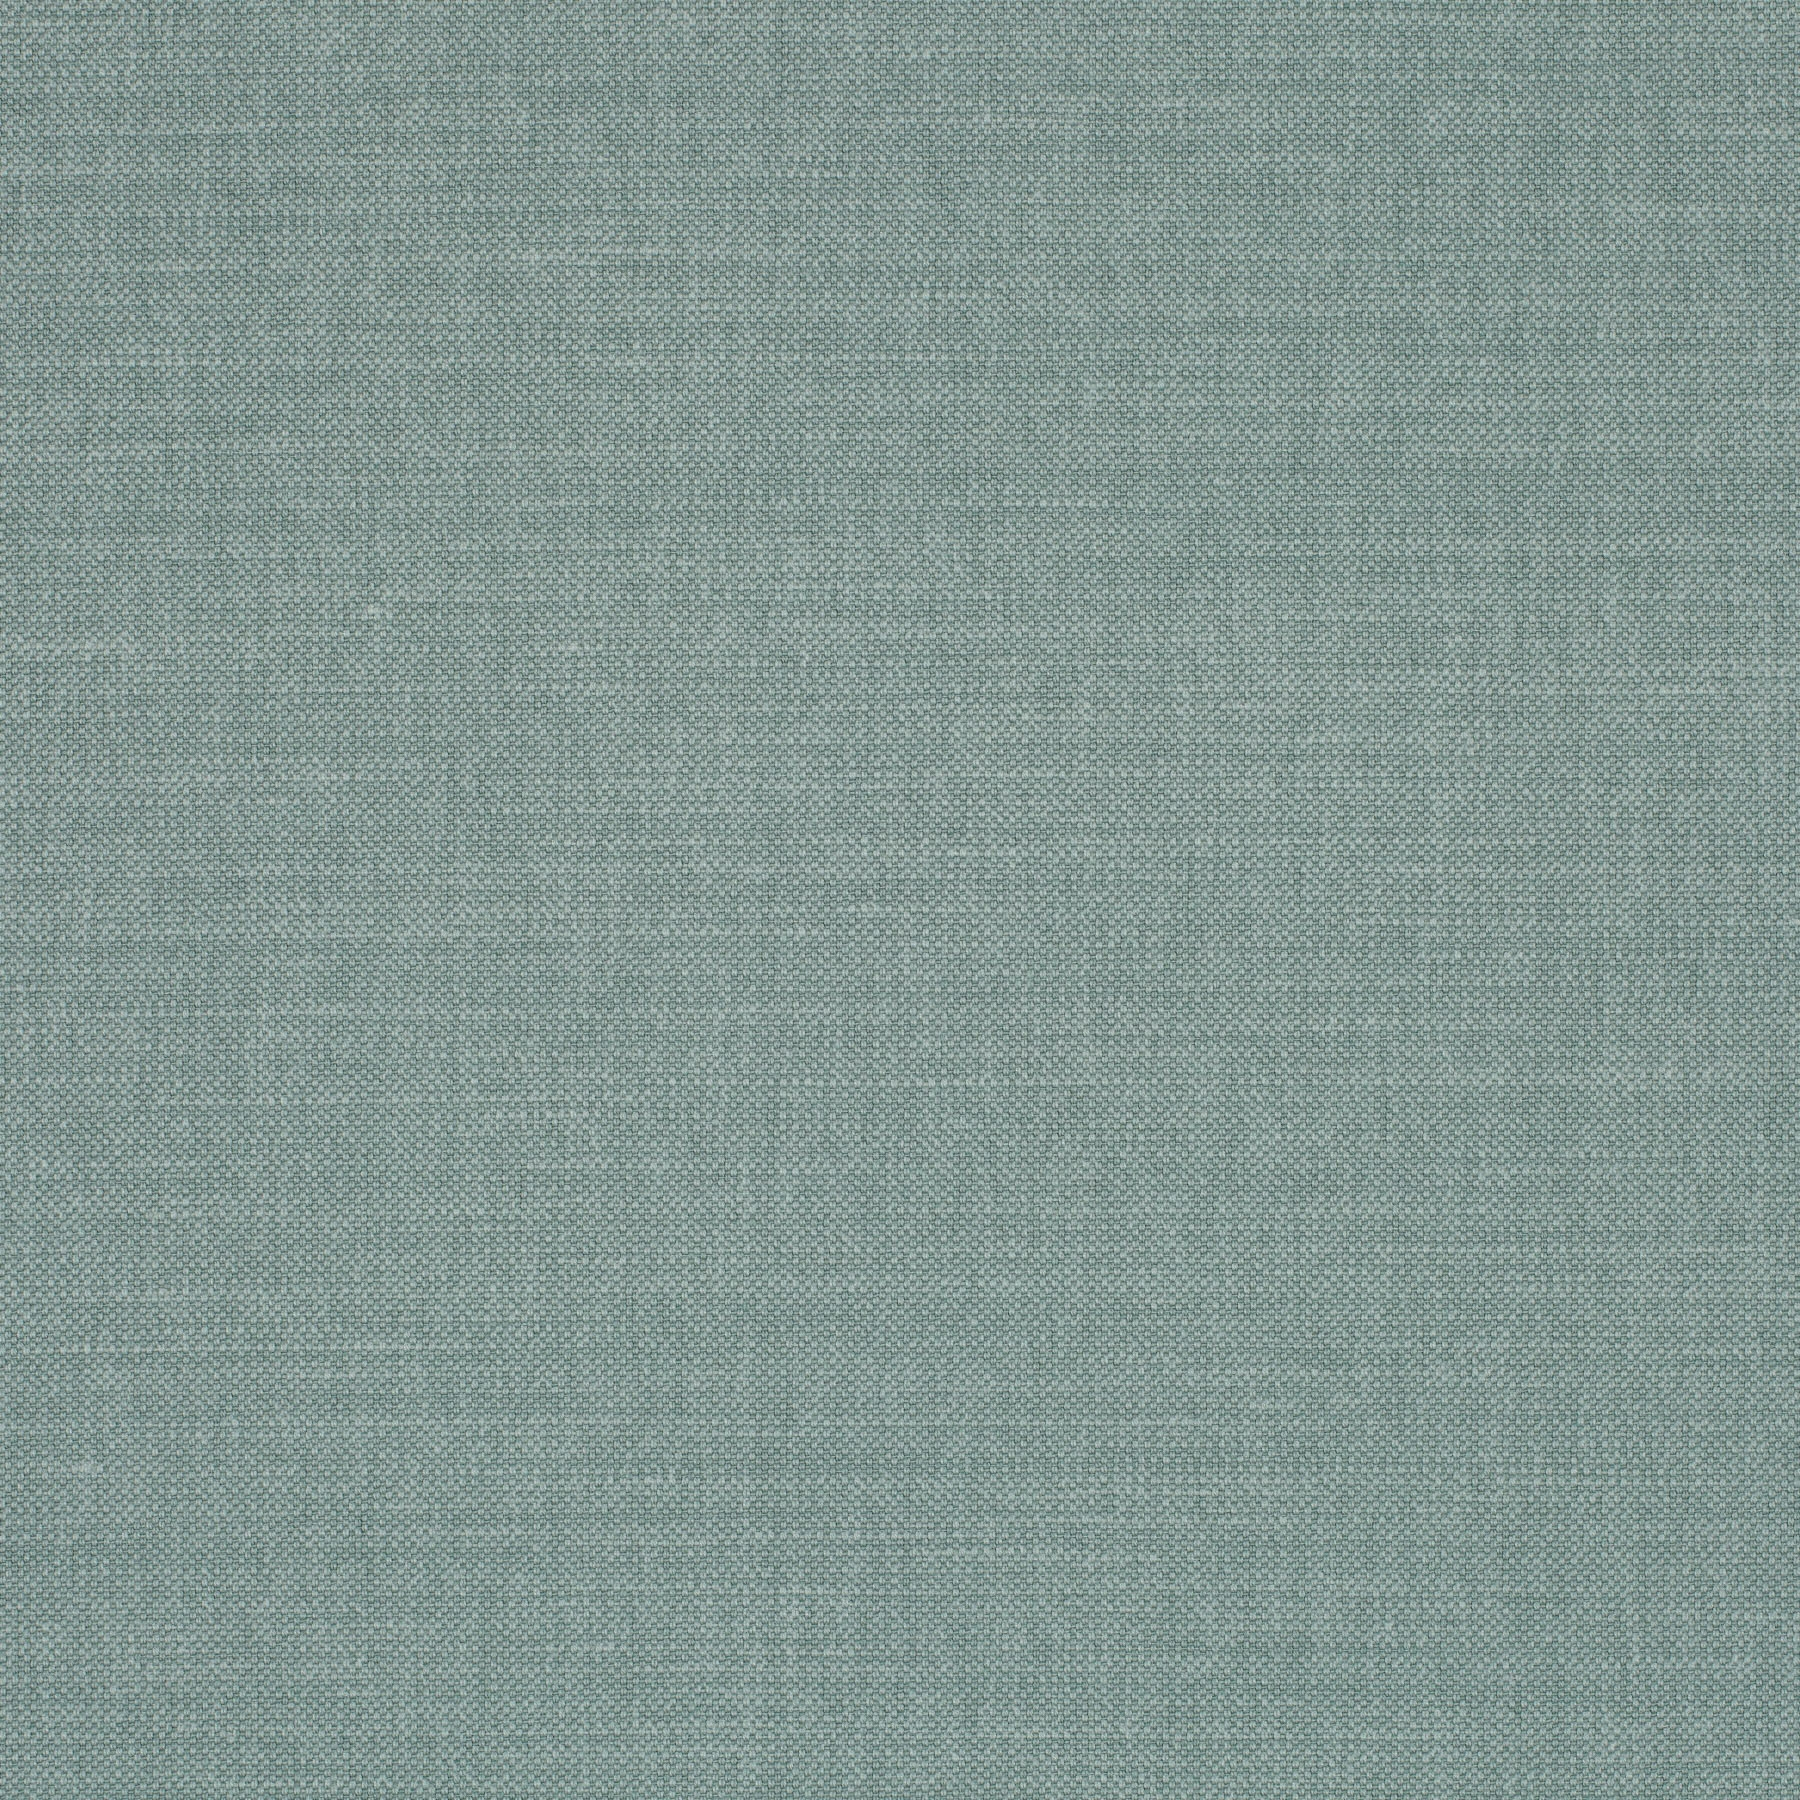 mørk støv-grøn hot madison CH1249/722-0